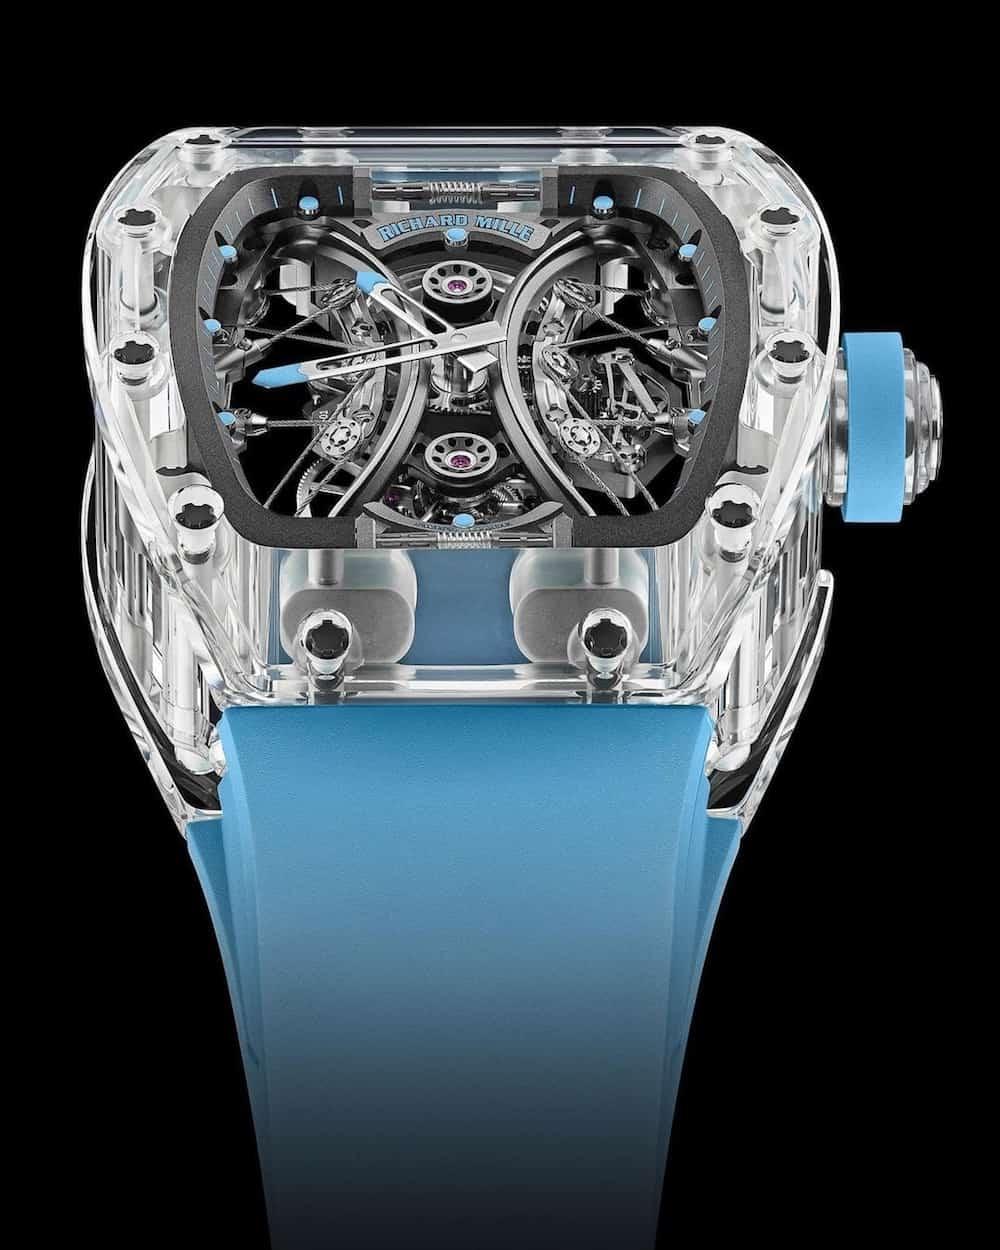 Richard Mille RM 53-02 Tourbillon Sapphire 5